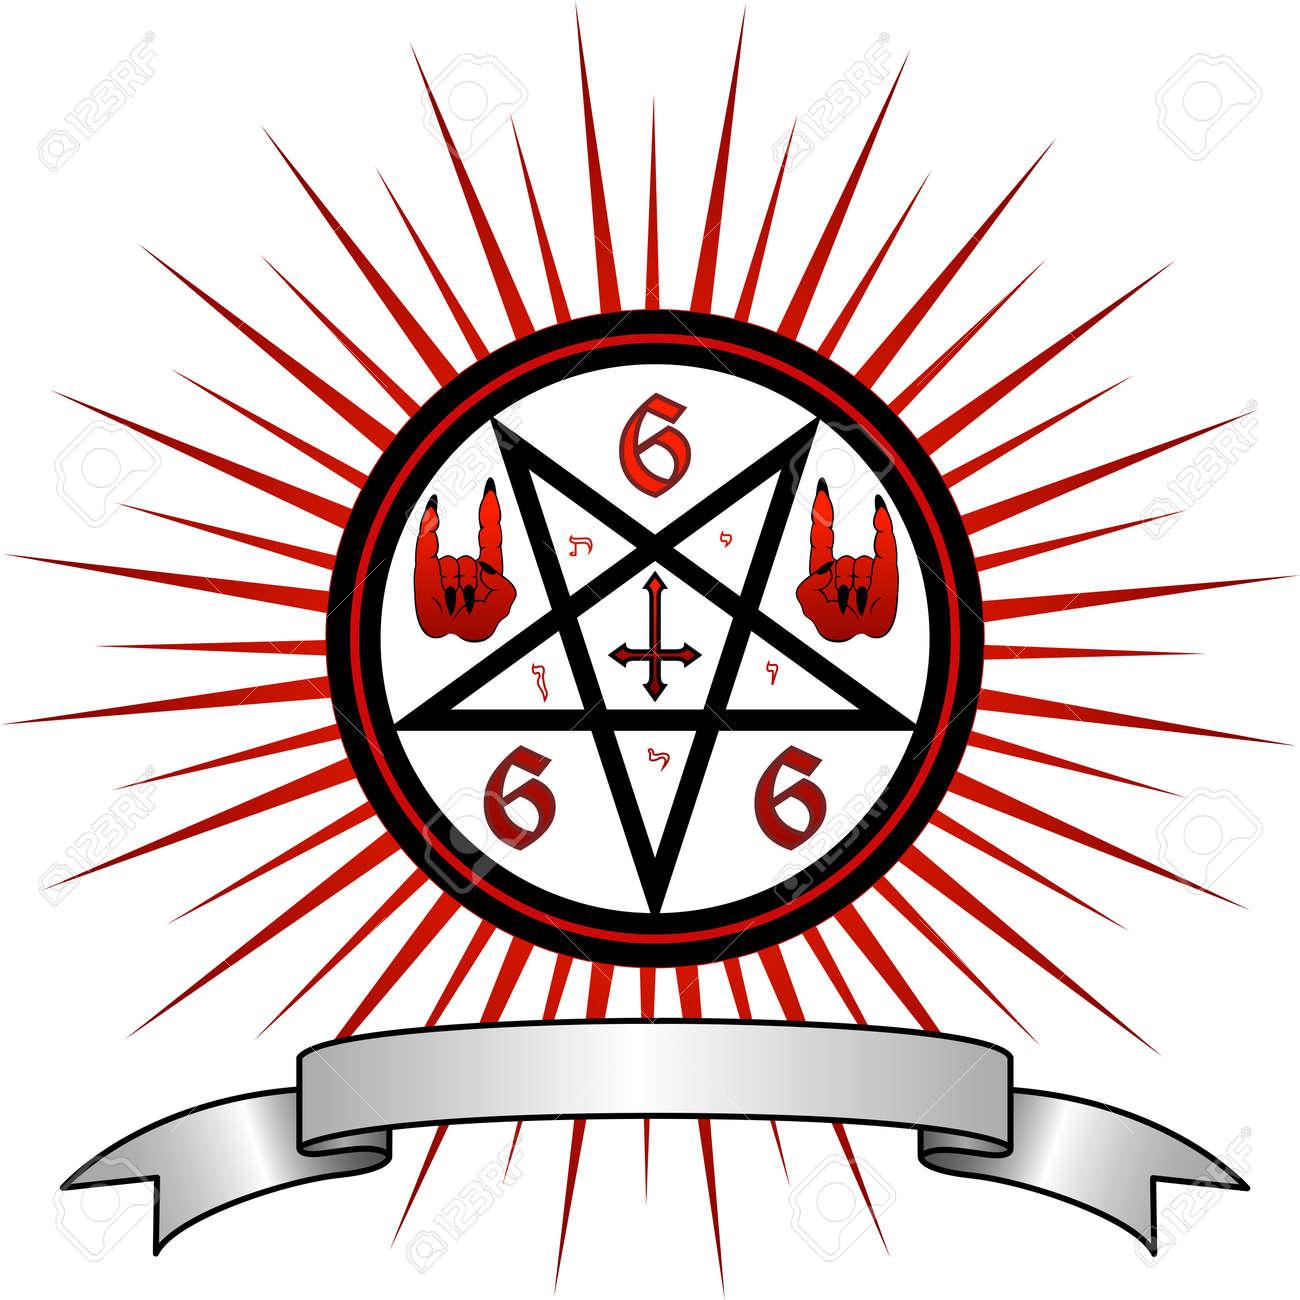 Illustration full of magic and satanic symbols royalty free illustration full of magic and satanic symbols stock vector 54023711 biocorpaavc